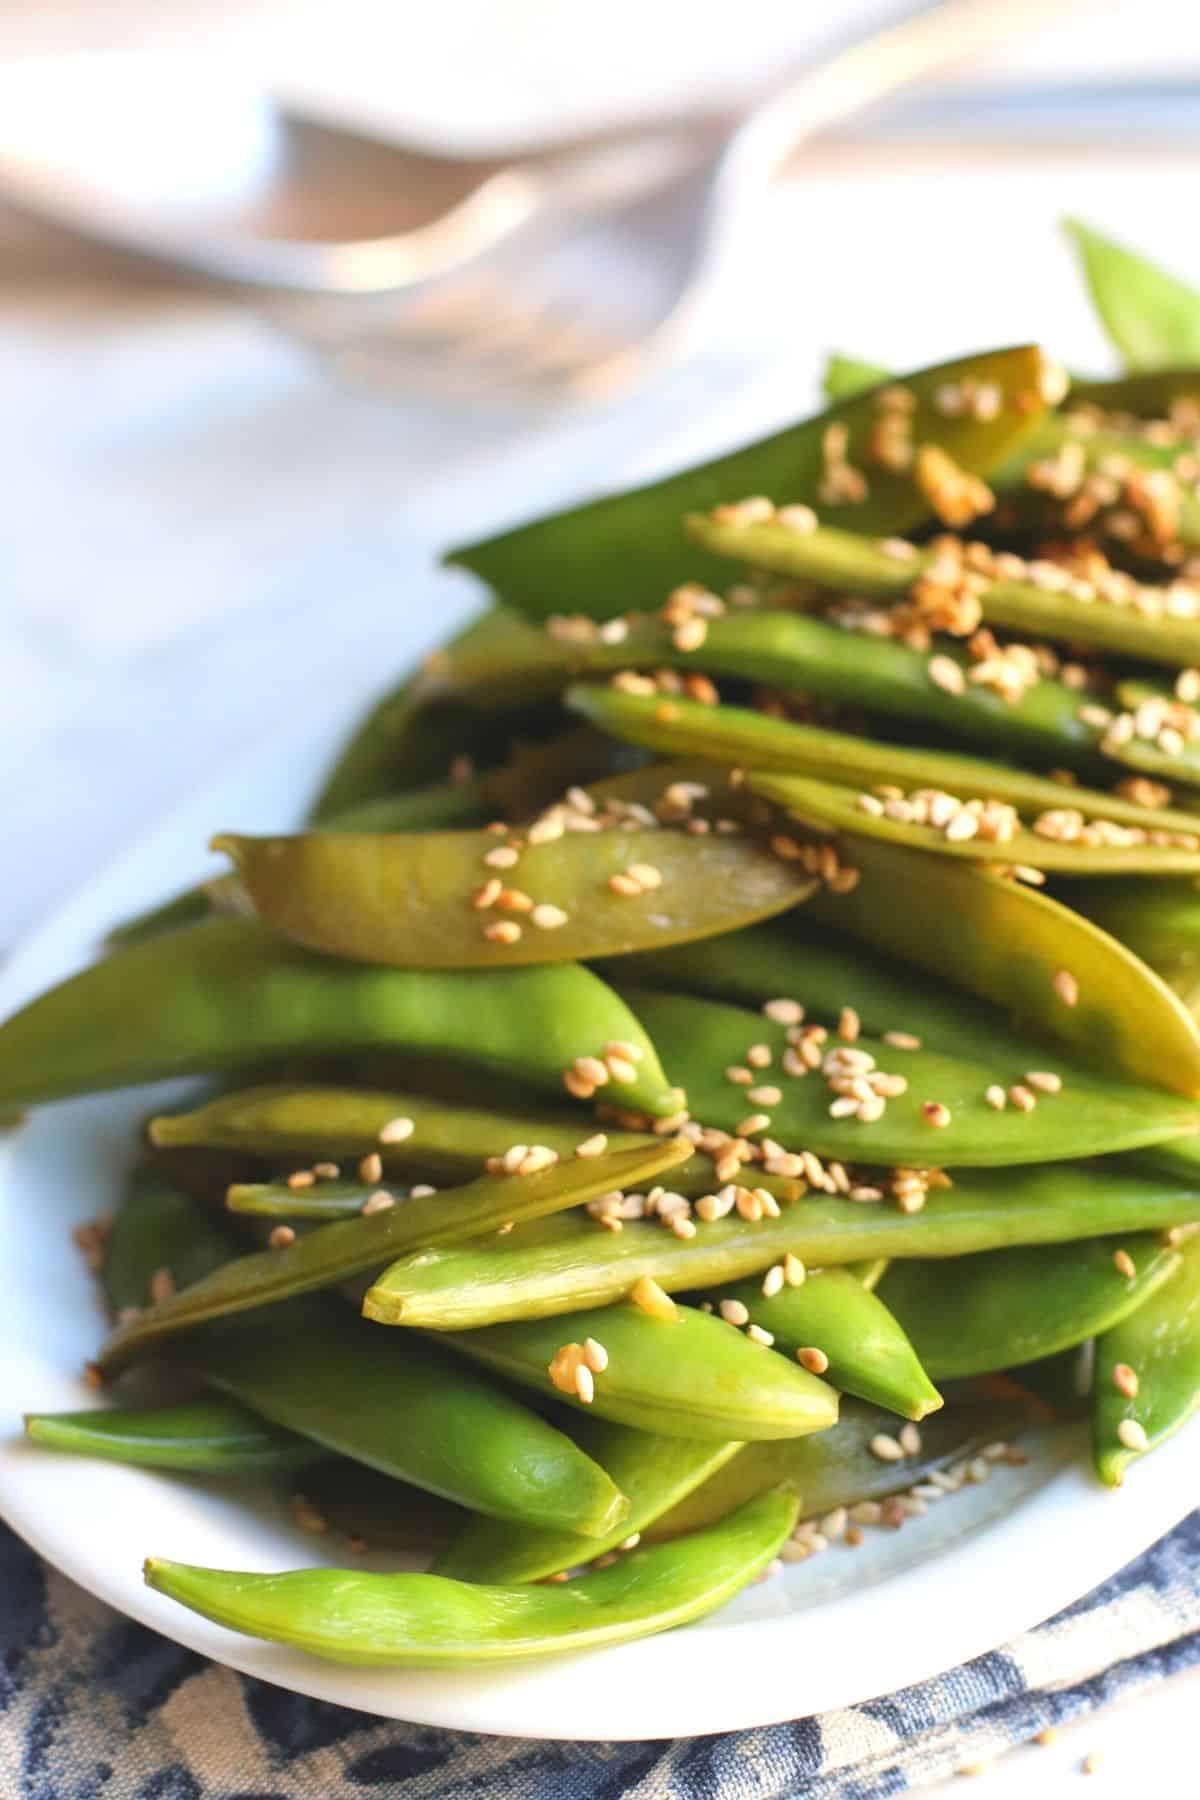 Platter of stir fried snap peas garnished with toasted sesame seeds